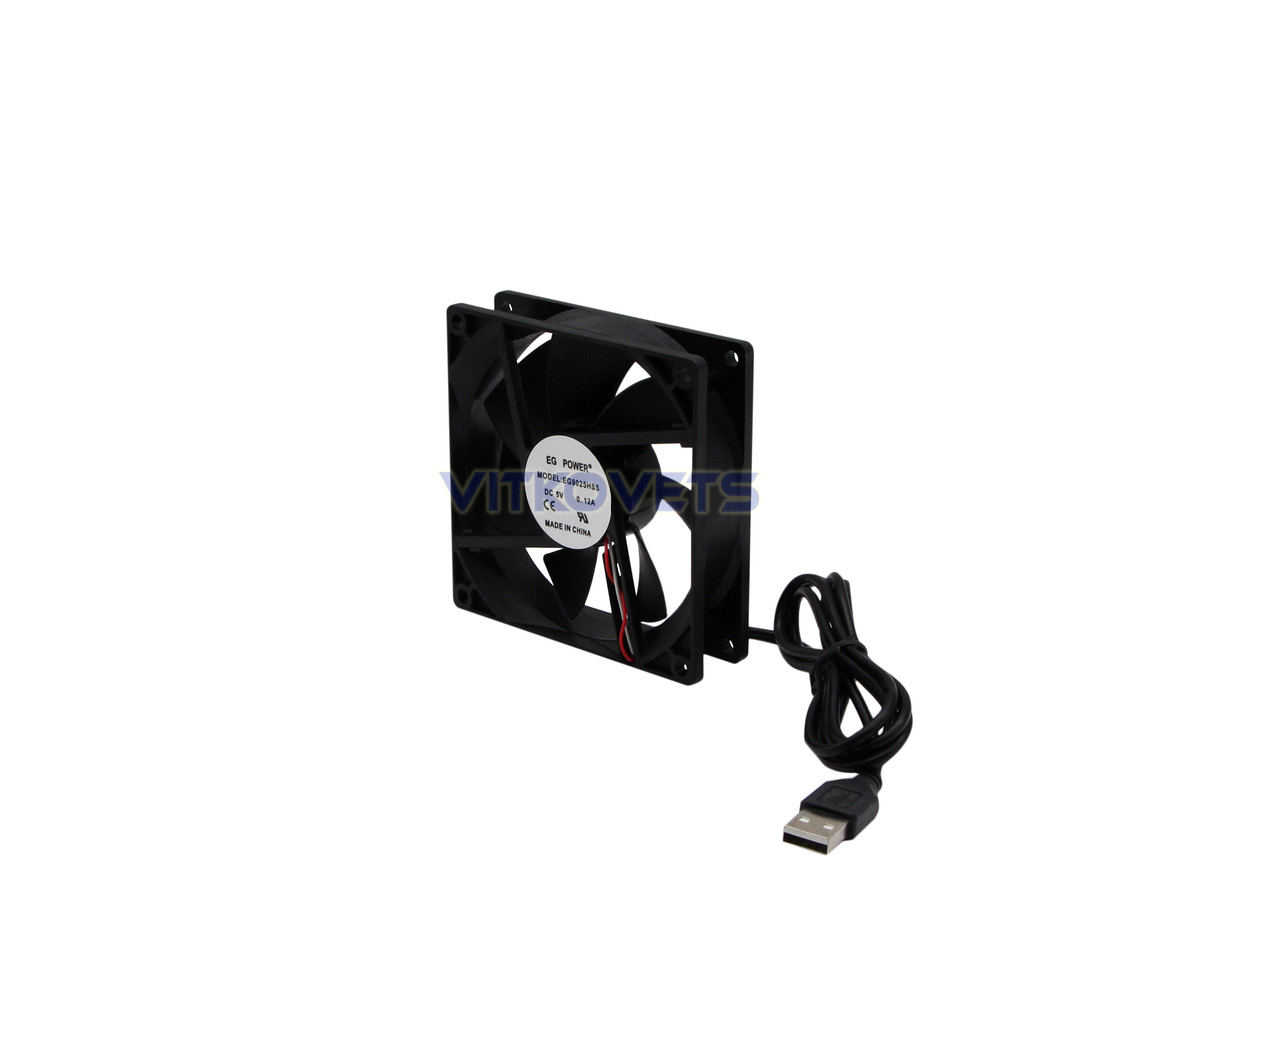 Вентилятор (кулер) EG9025HSS 92х92, 5V, 0.12A (USB)